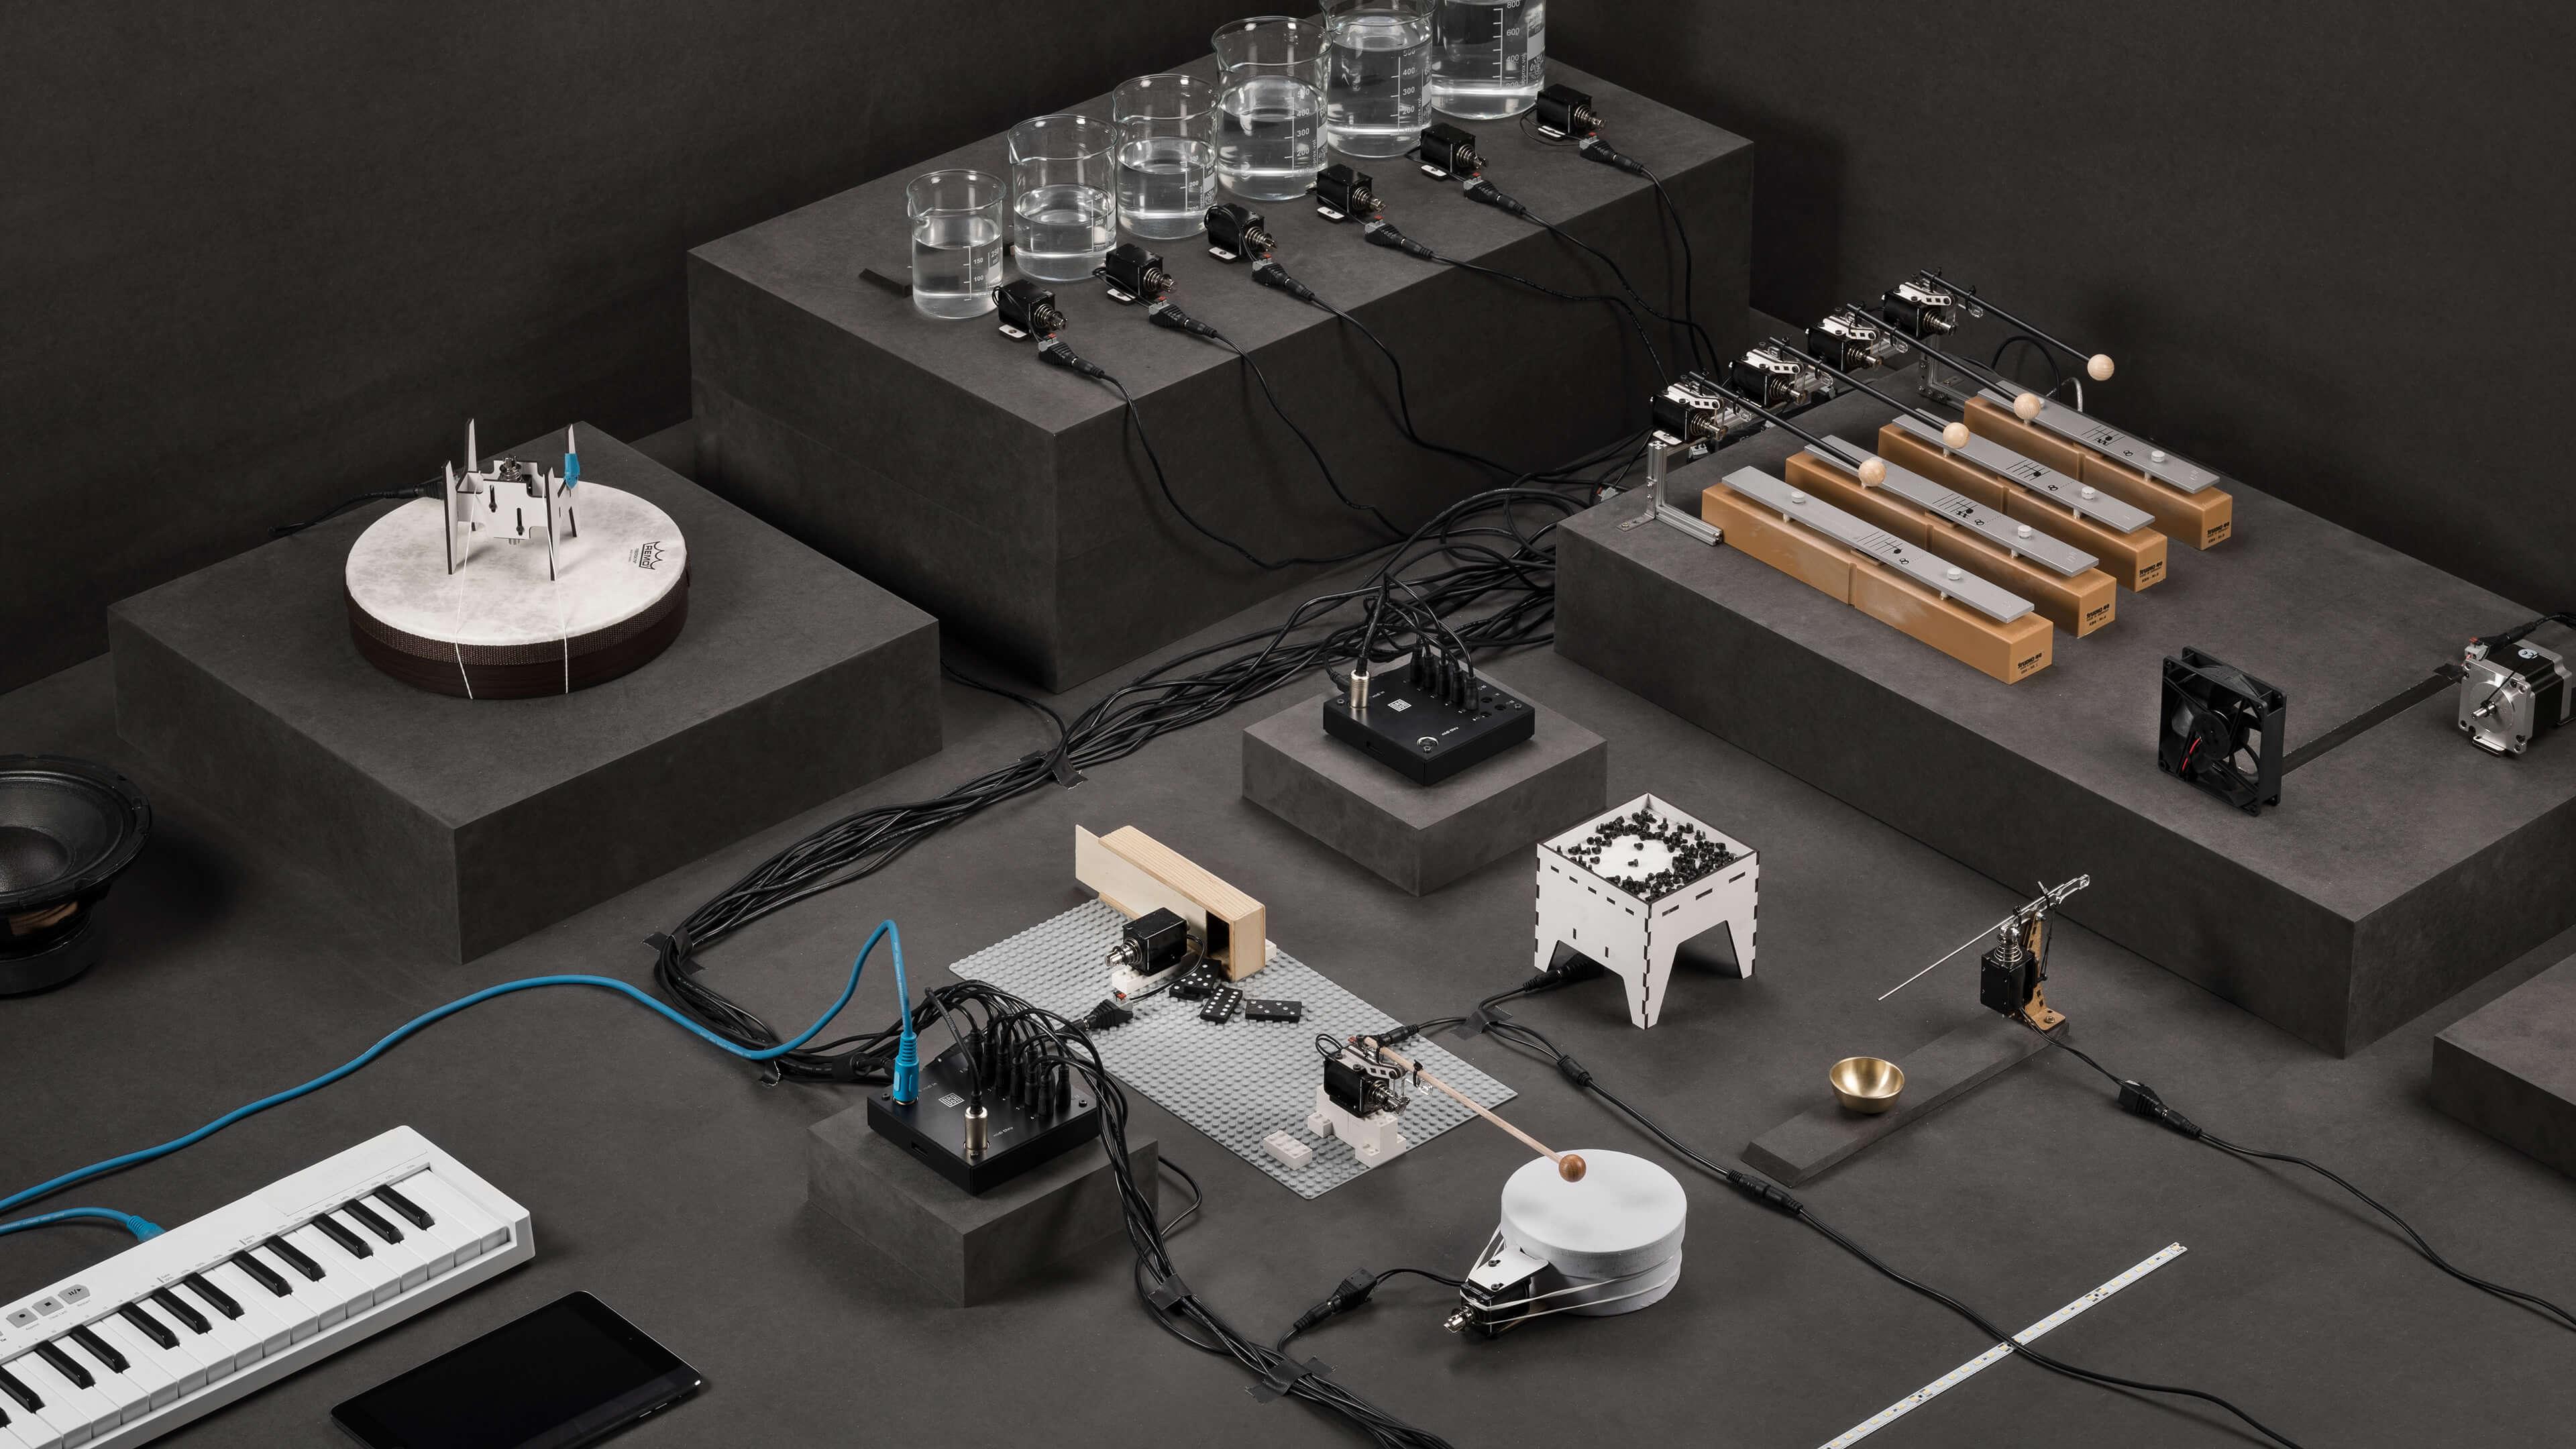 На Kickstarter собирают деньги на создание автоматического барабанщика